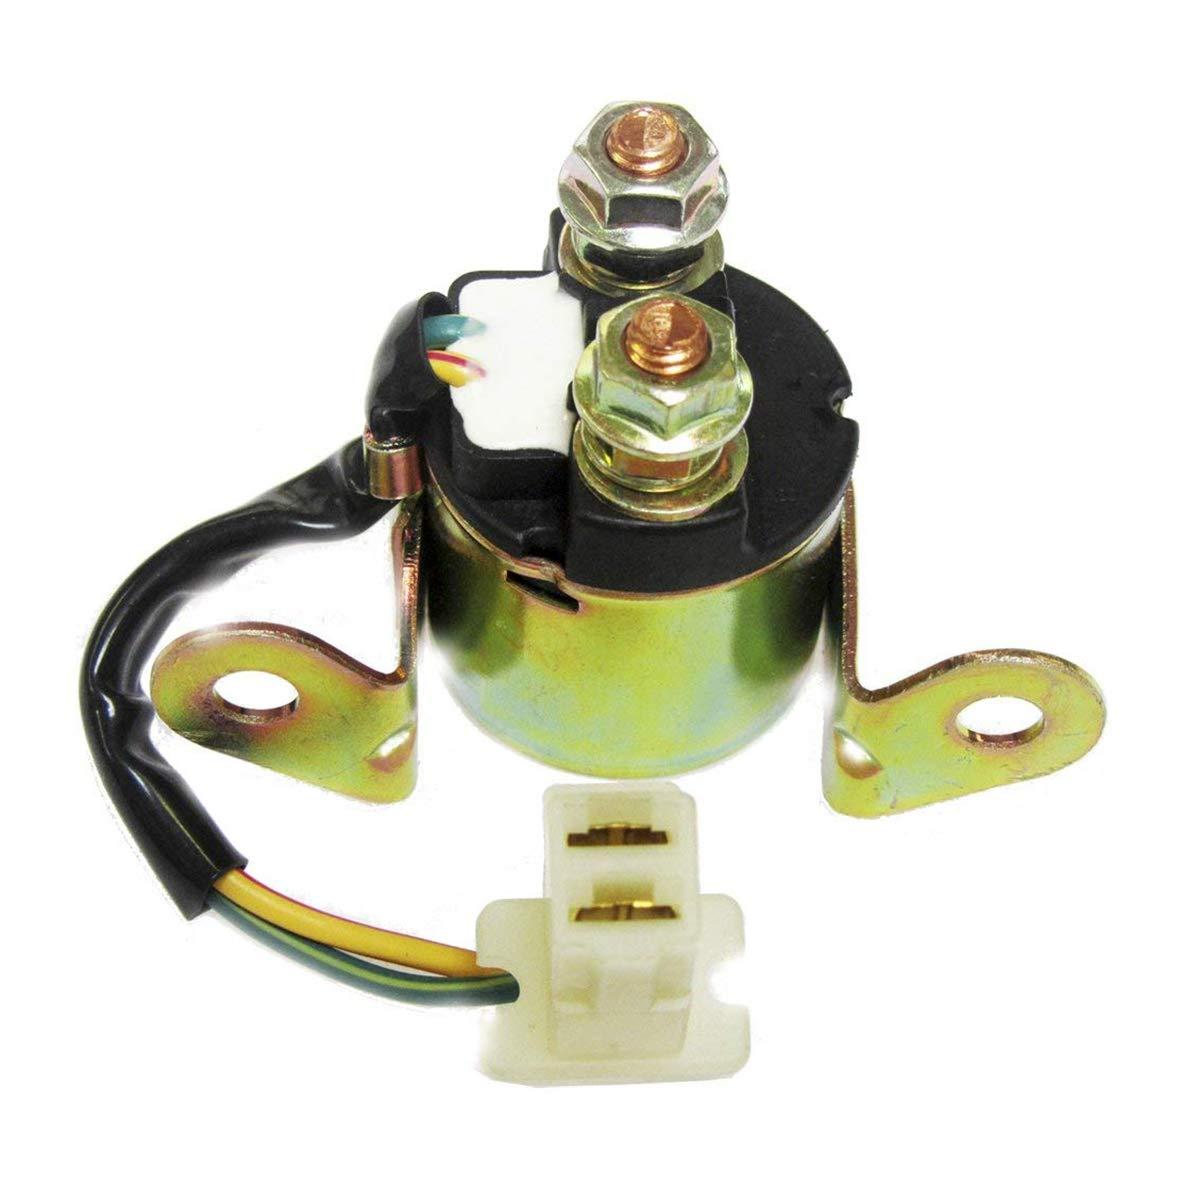 Starter Solenoid Relay Fits for Suzuki DR200SE GR650 DR200S DR125SE VS800 VS800GL VX800 VS700GLP VS750GLP 1994-2009 Motorcycle 31800-15501 31800-15500 31800-31300